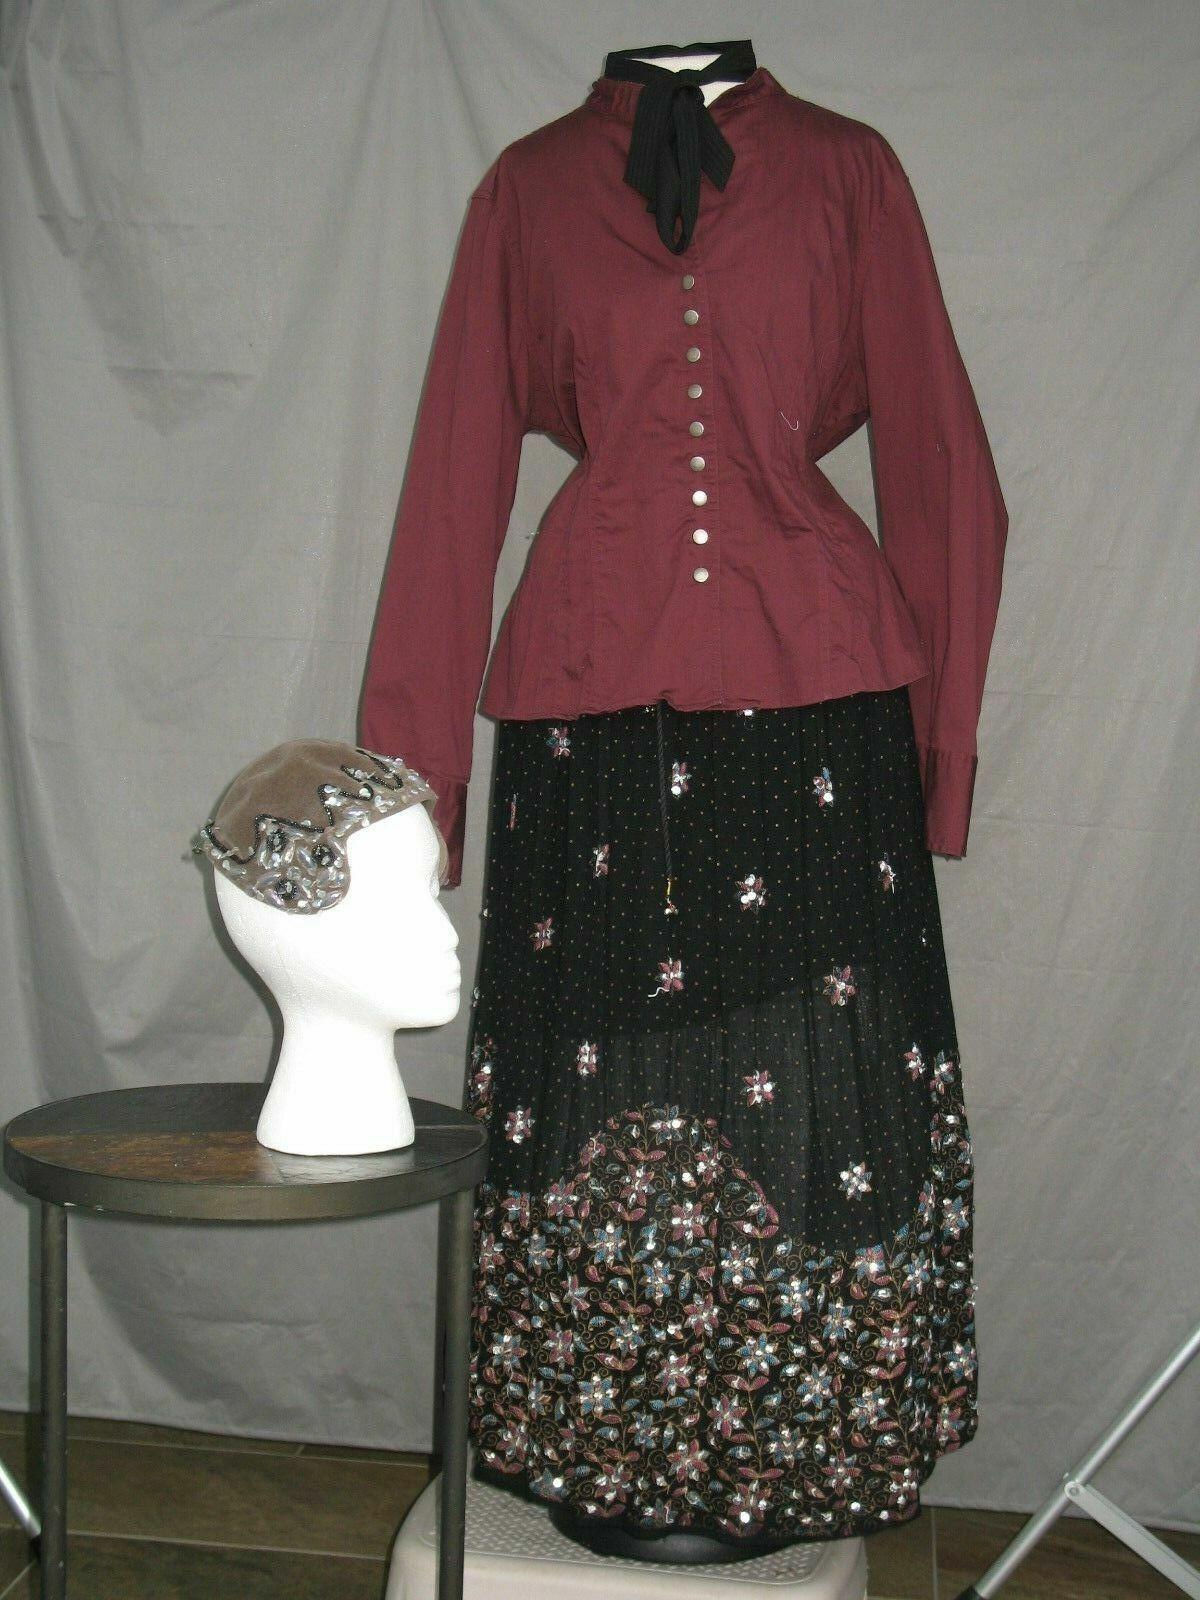 Victorian Dress Women's Edwardian Costume Civil War Reenactment Outfit & Hat